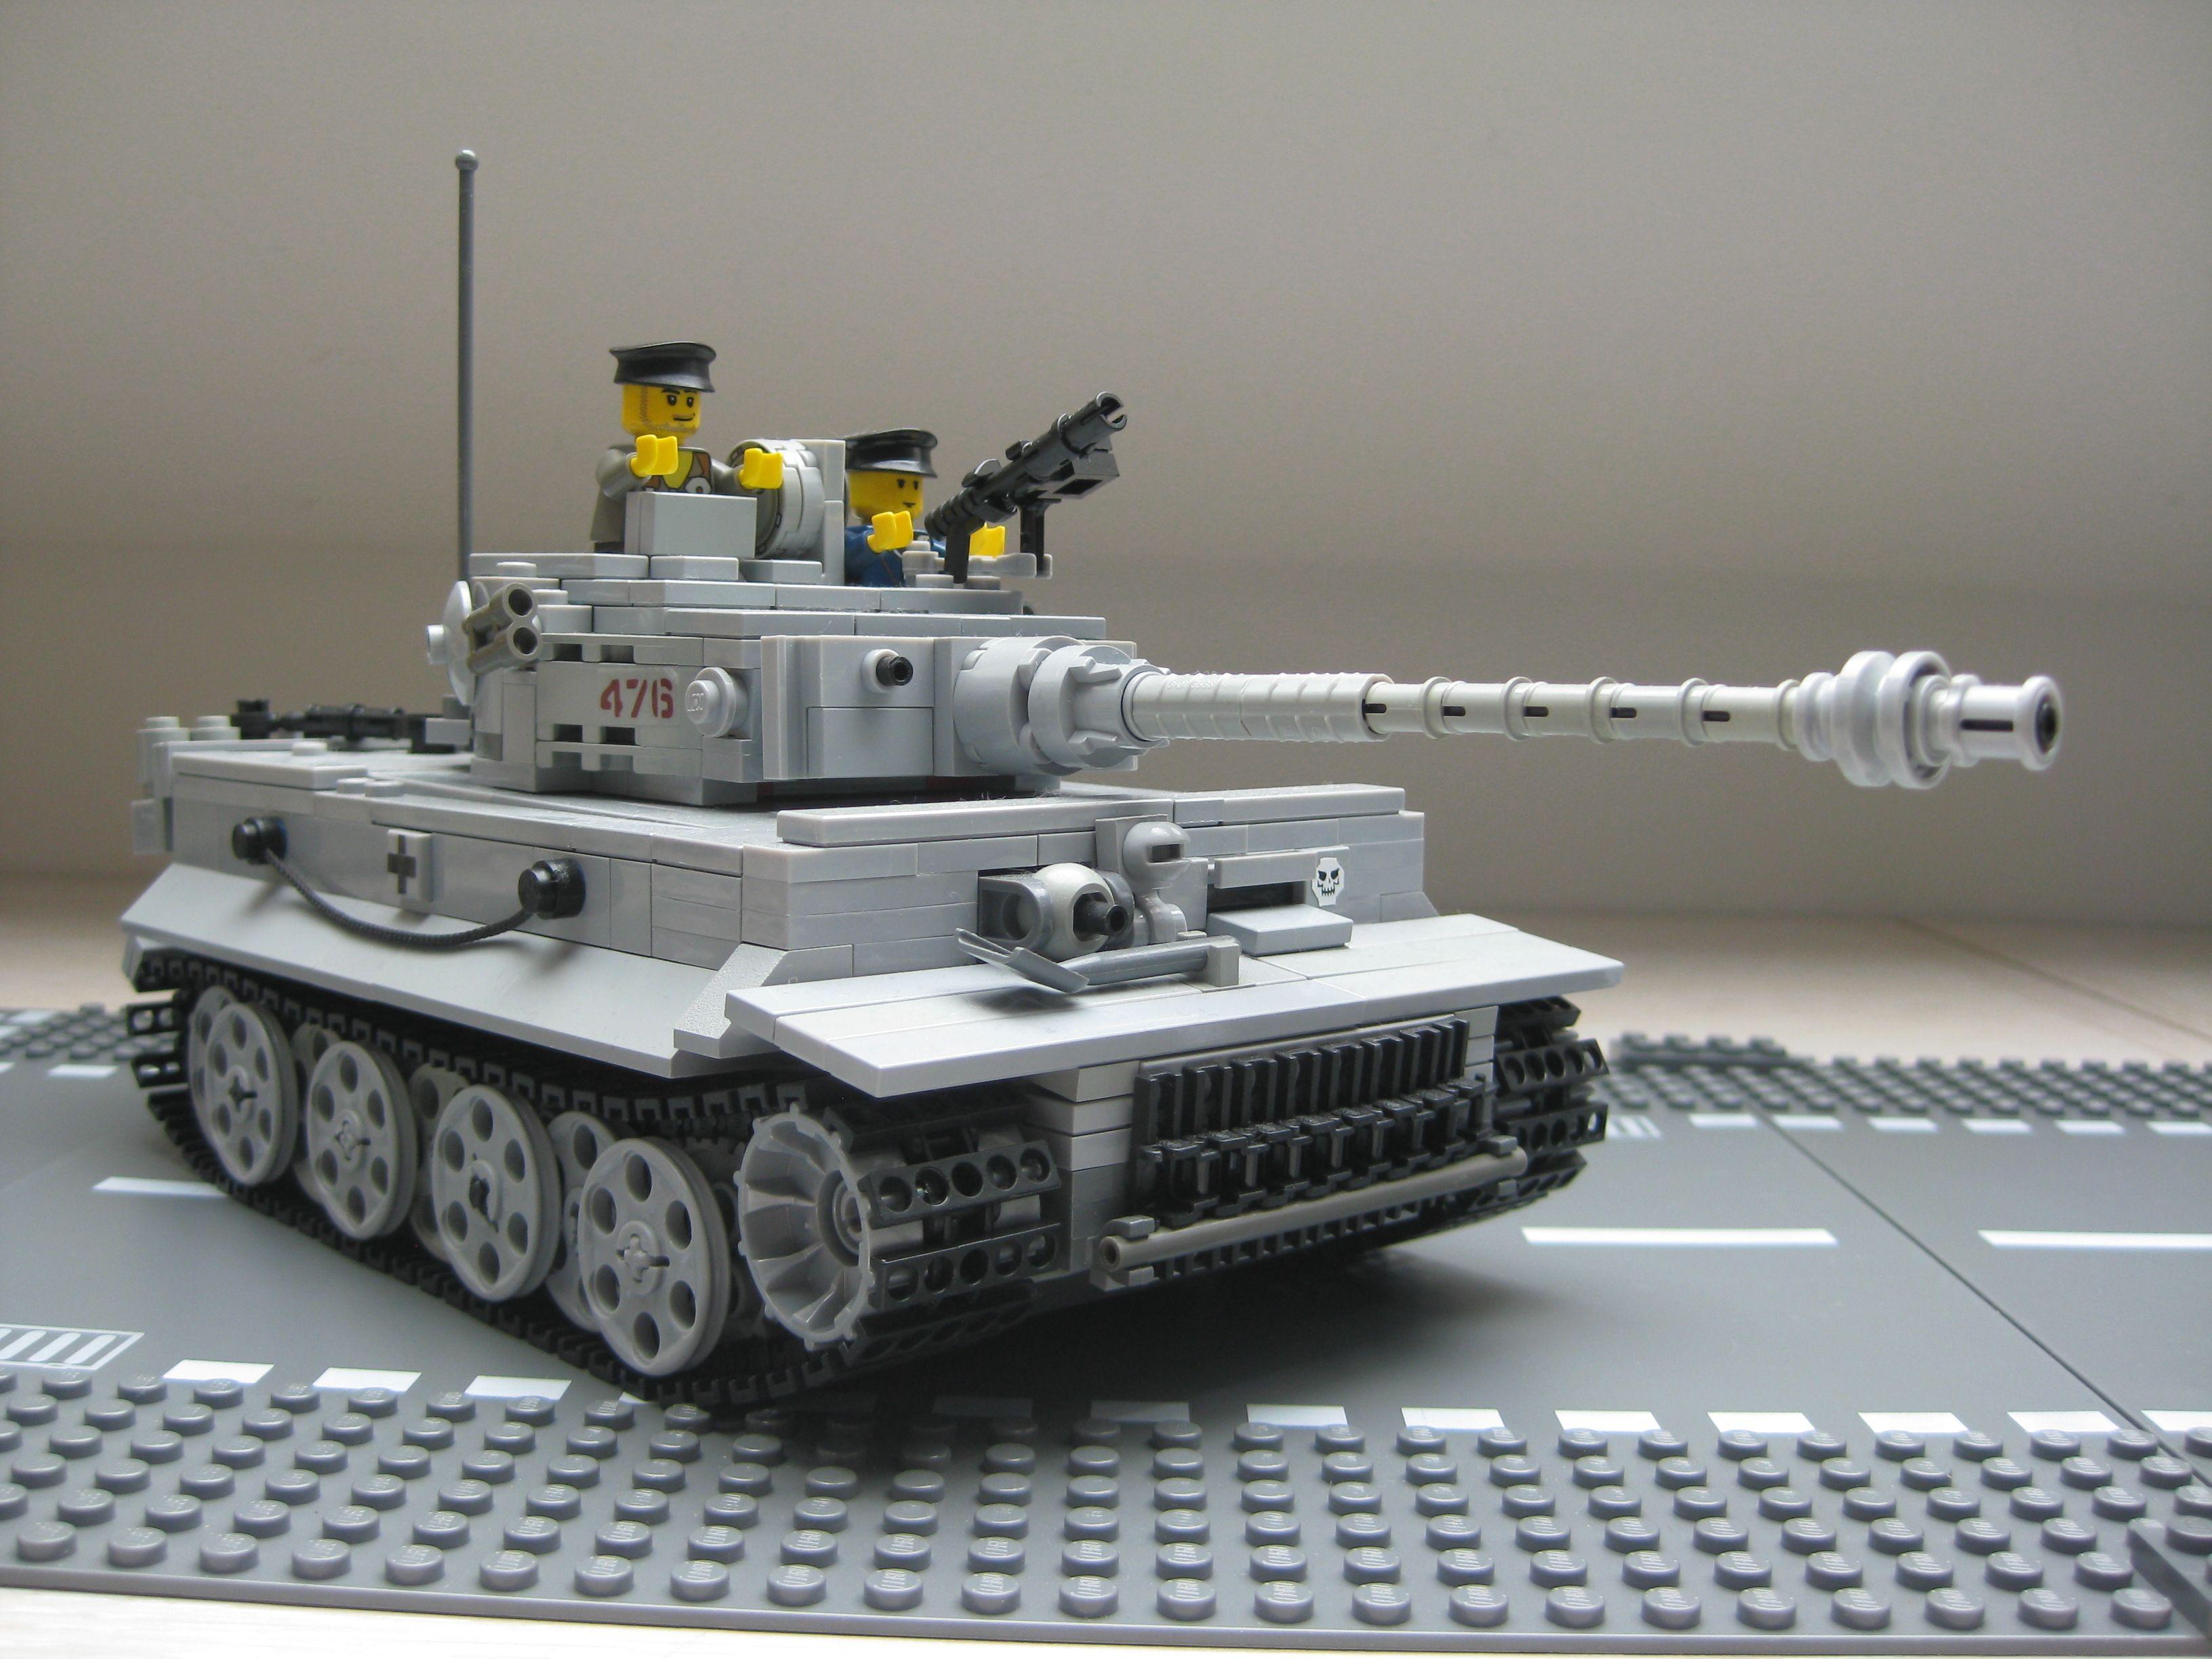 MECHANIZED BRICK Custom LEGO Tiger I Tank Kit